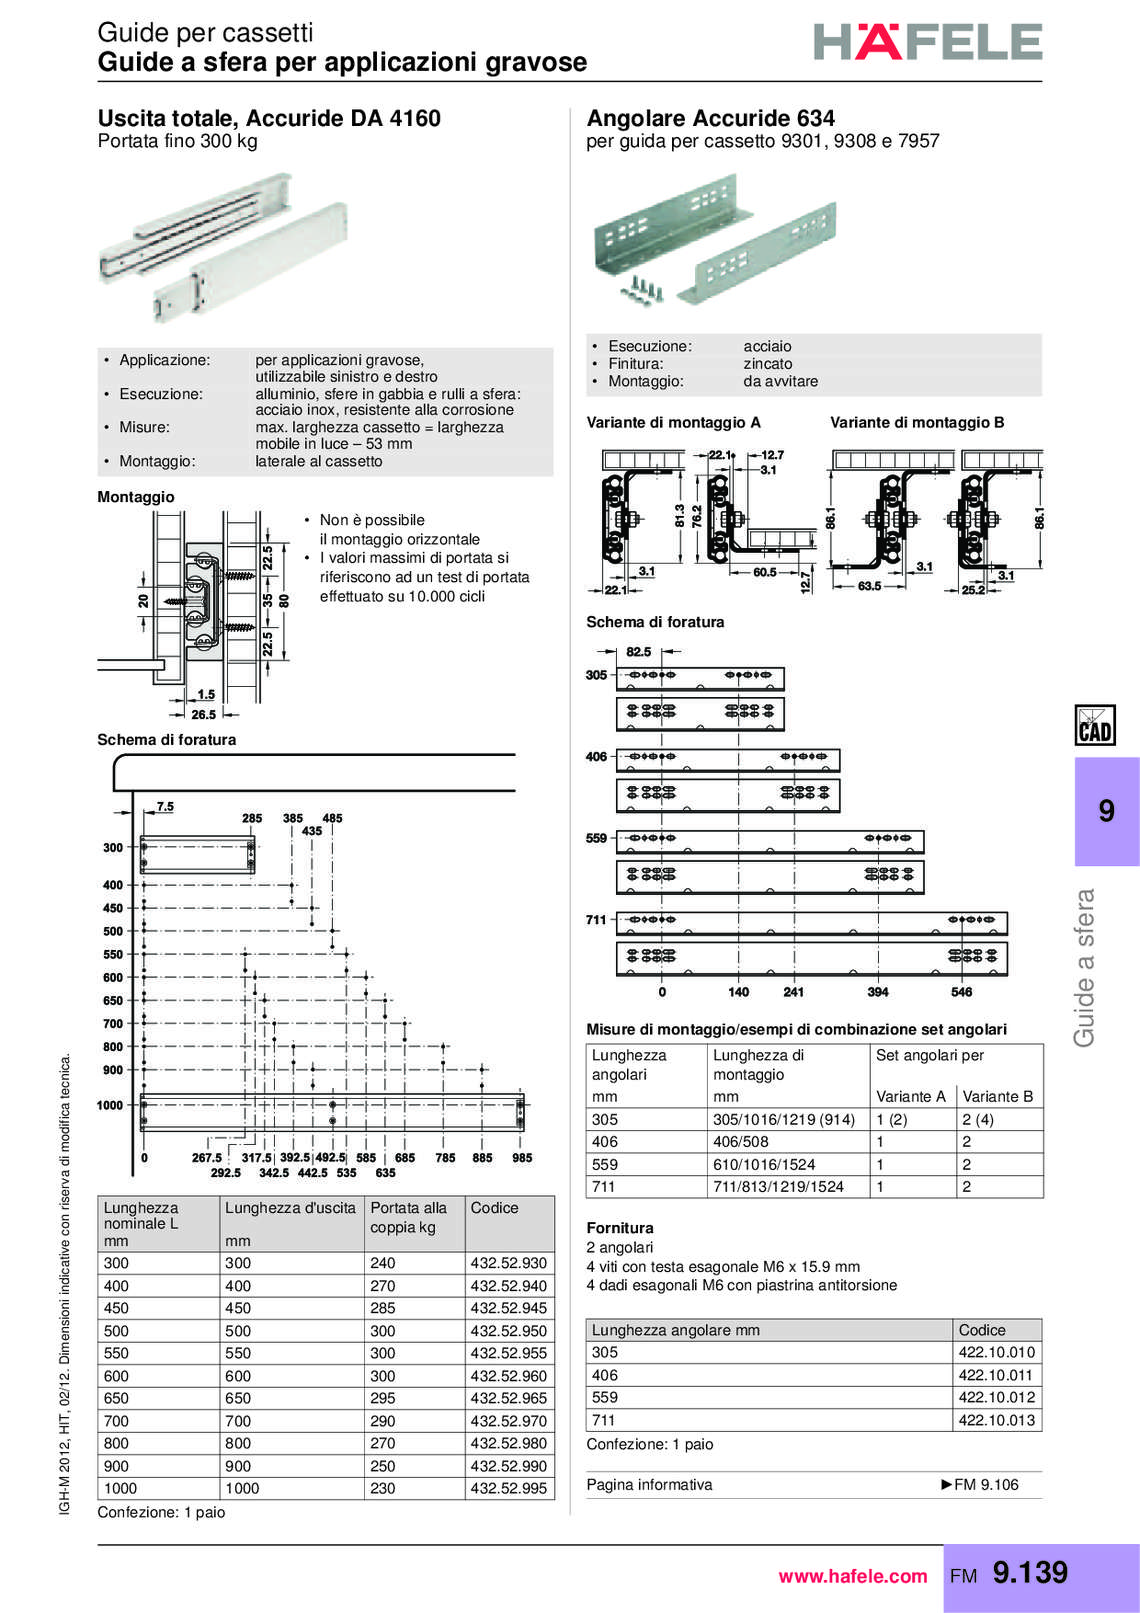 hafele-spondine-e-guide-per-mobili_40_196.jpg